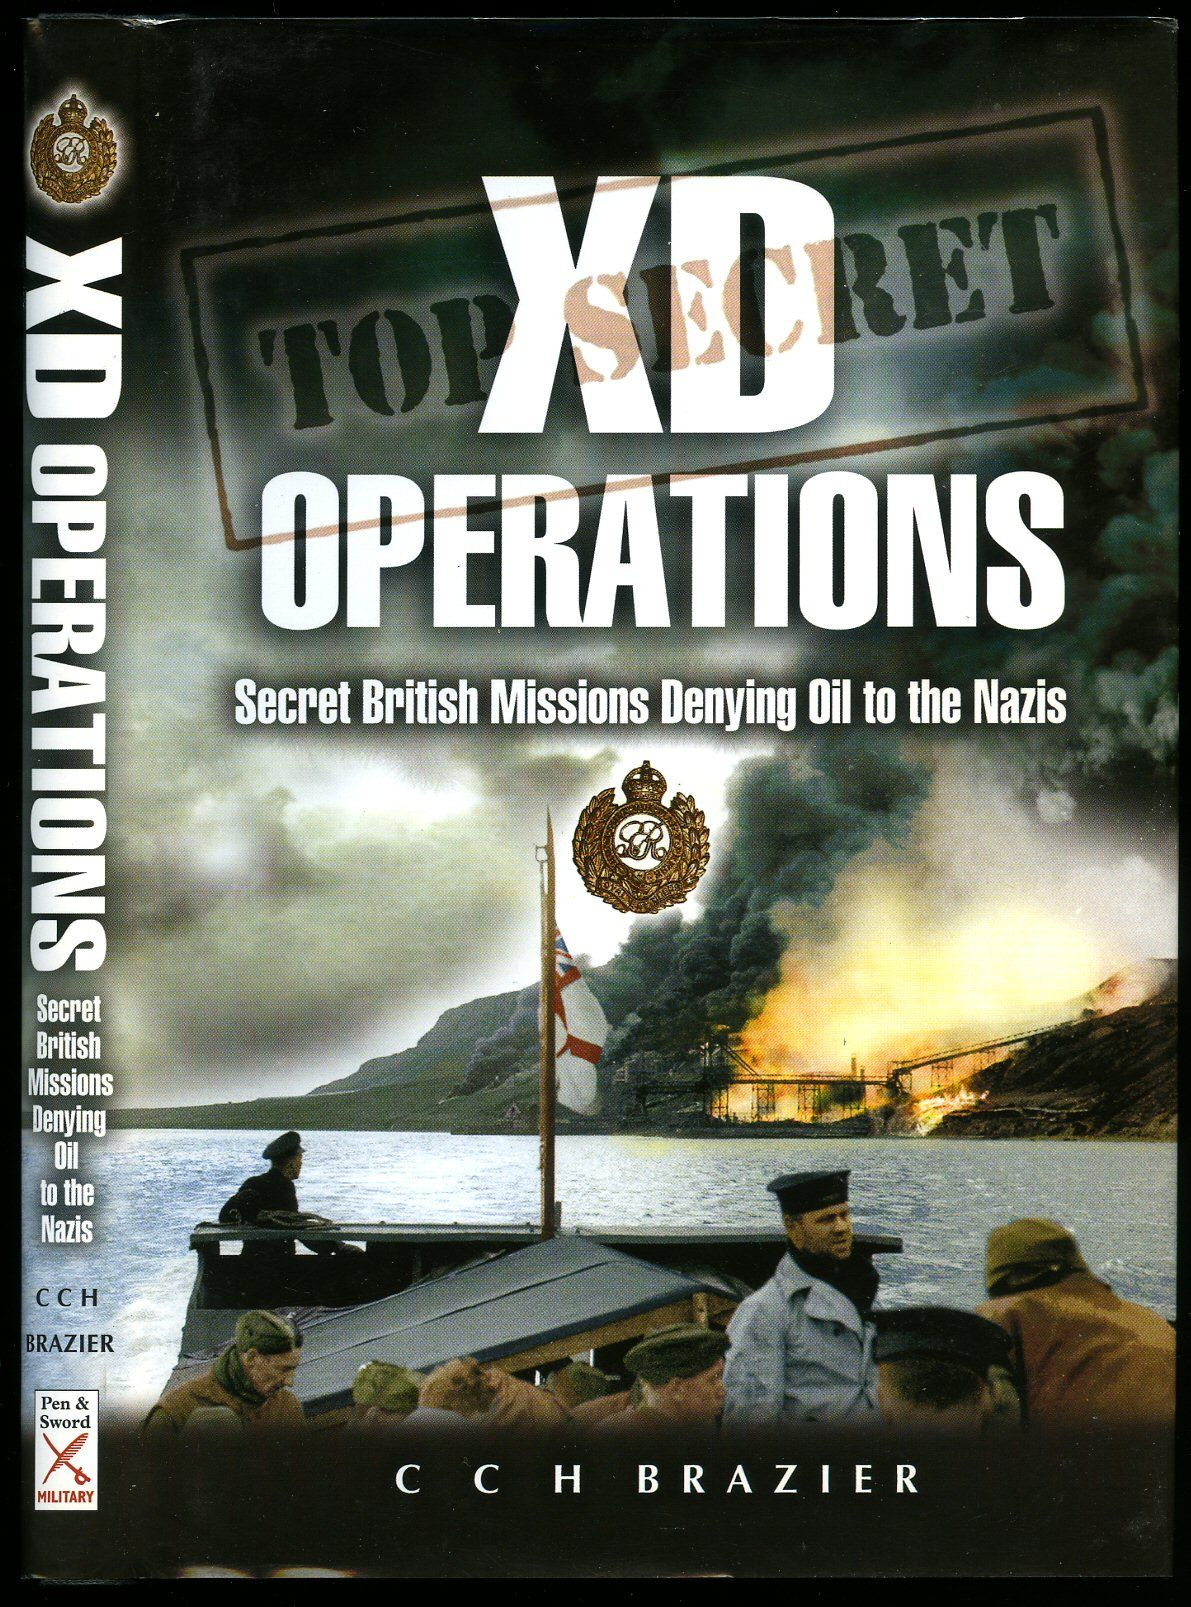 9781844151363 - XD OPERATIONS Secret British Missions